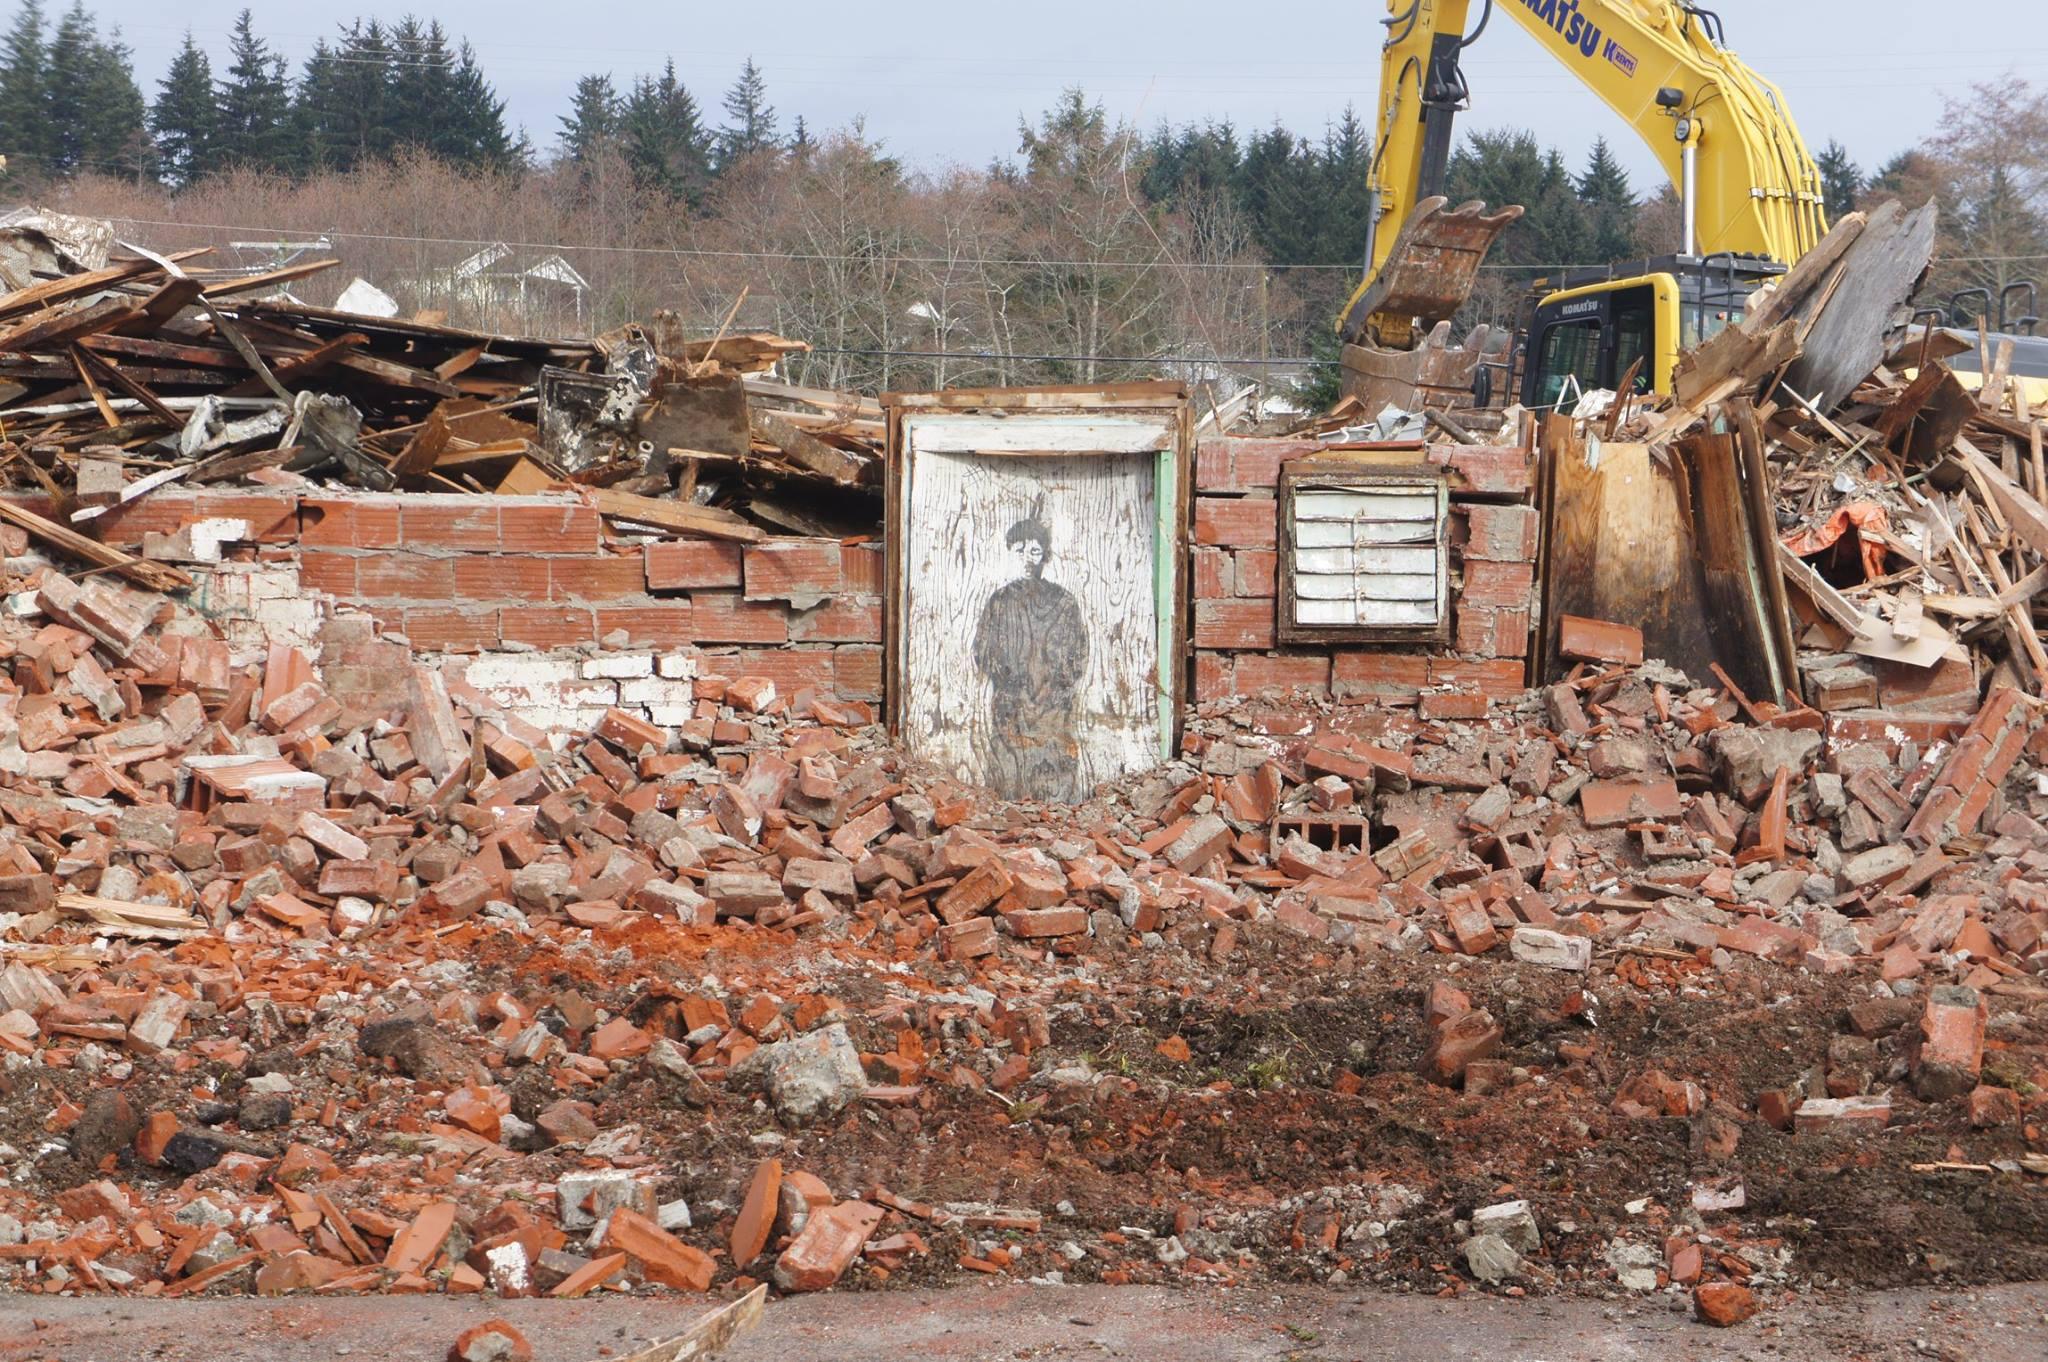 Demolition of the St. Michael's Residential School in Alert Bay, BC. Photo by Trevor Isaac, Kwakwaka'wakw